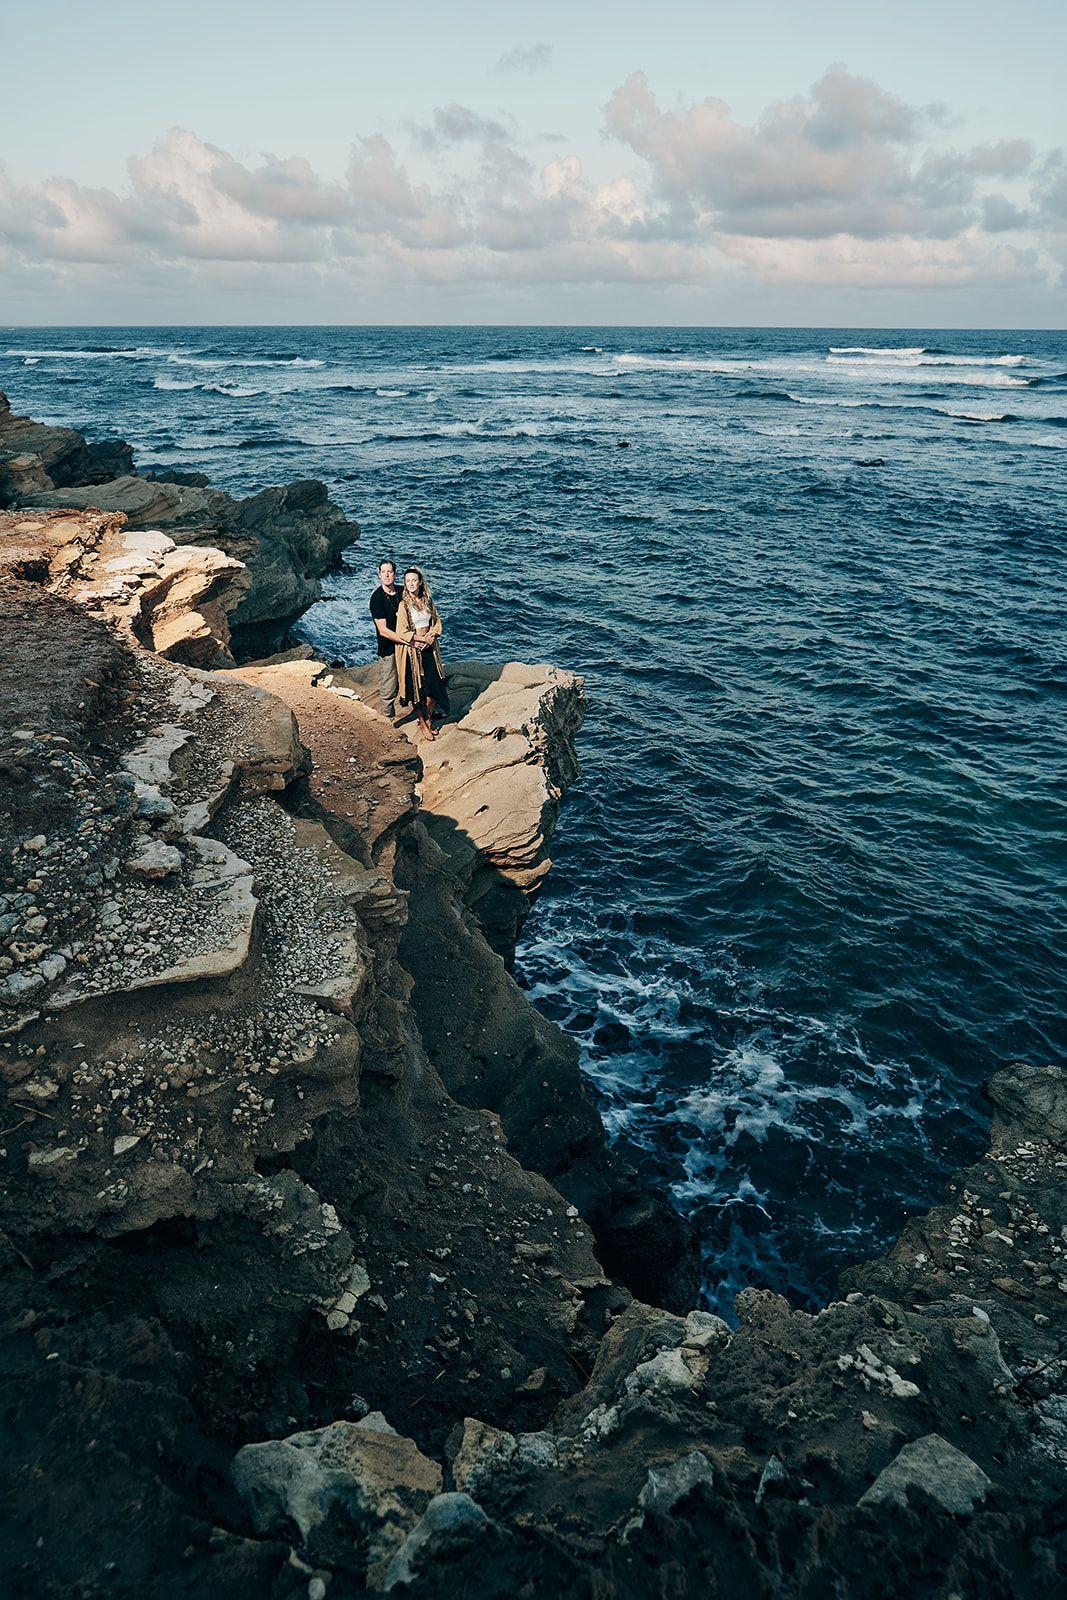 kauai-engagement-photographer-shipwrecks-beach-afewgoodclicks 44